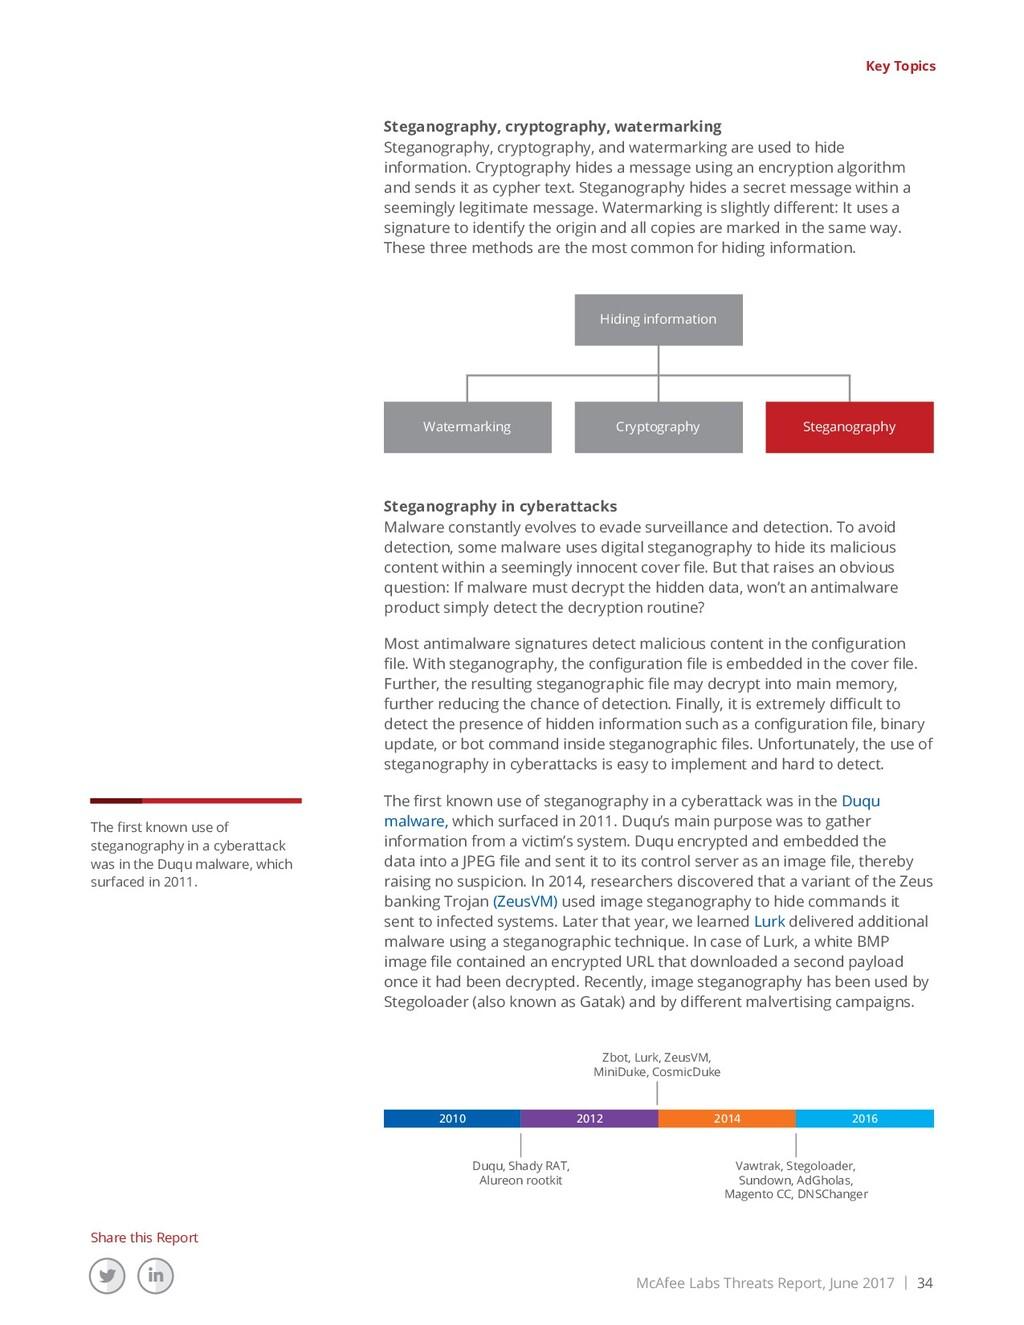 McAfee Labs Threats Report, June 2017 | 34 Shar...